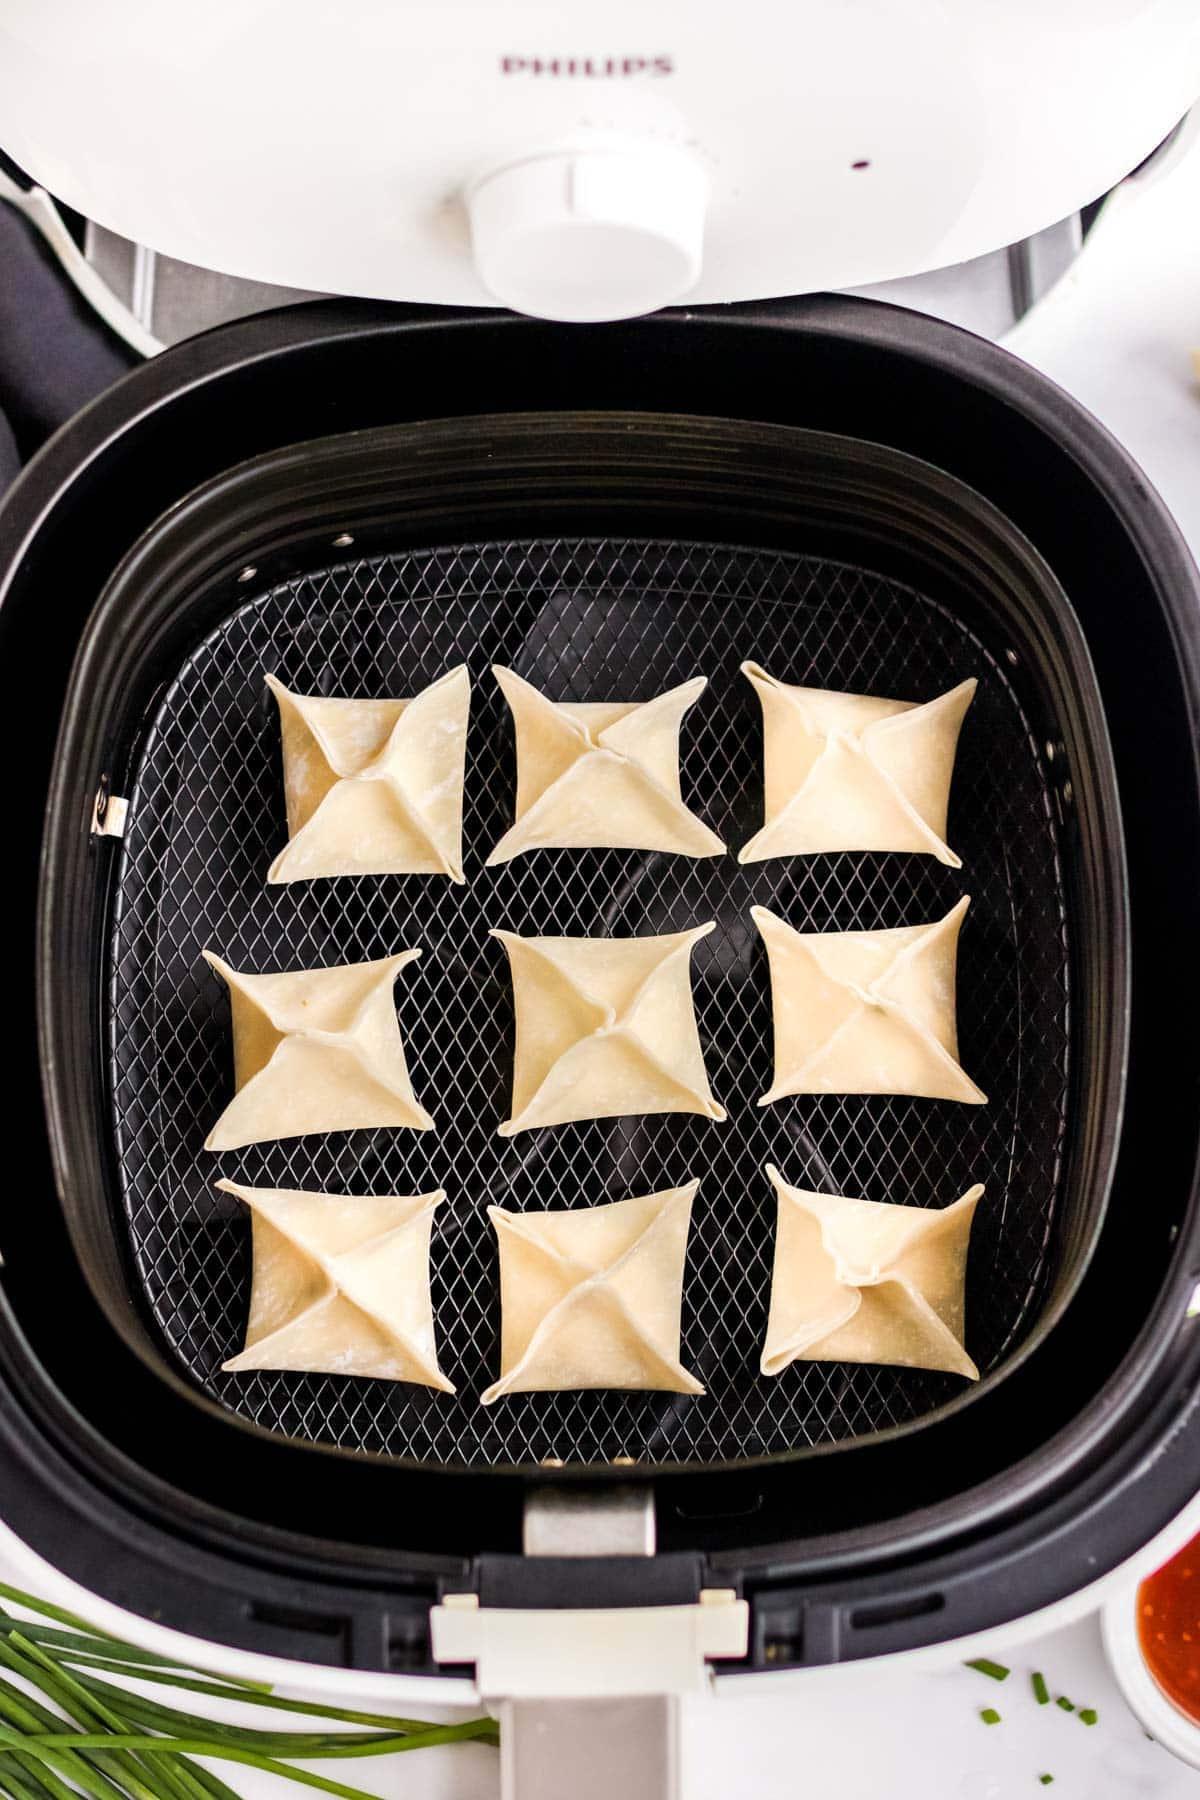 uncooked wontons in air fryer basket